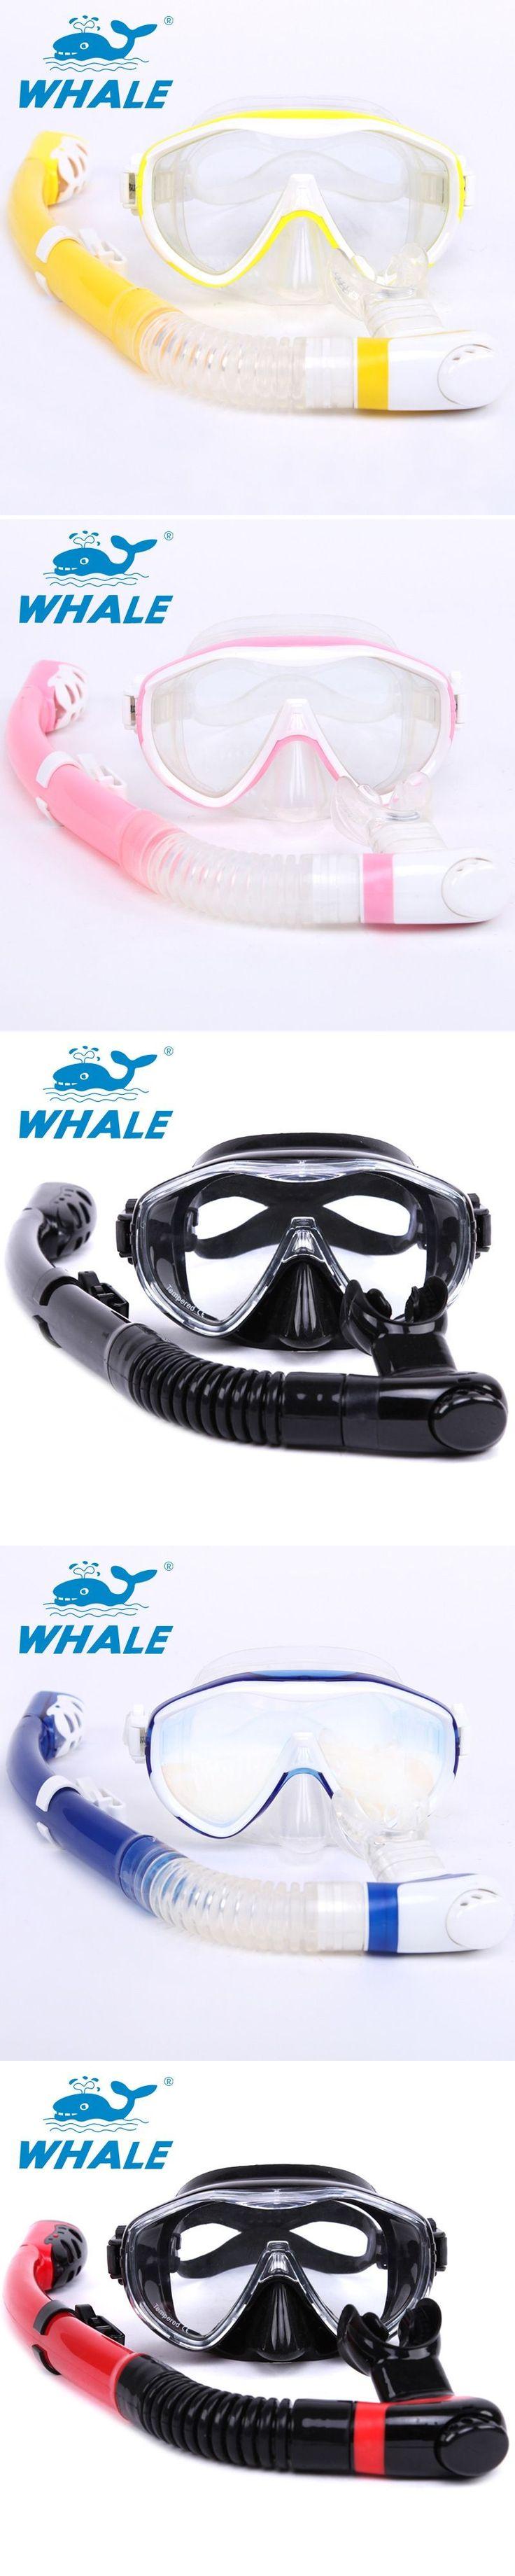 Hot sale Water Sport Training Diving glasses Anti-Fog Snorkeling Equipment Breathing tube Silicone Scuba Diving Mask Snorkel set #scubadivingequipmentmasks